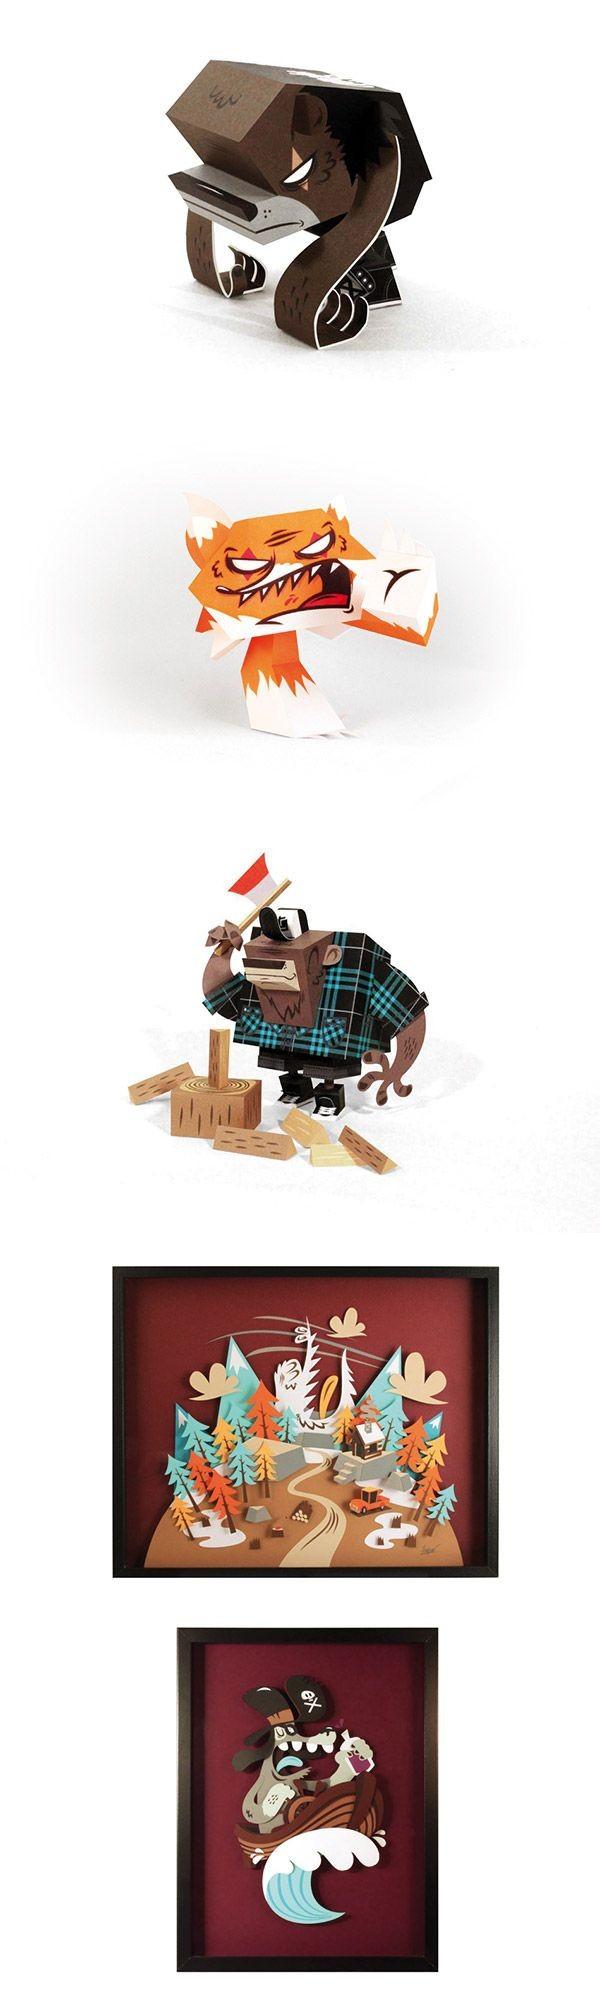 Ross Papercraft Show 41 Best Paper tougui1 Images On Pinterest